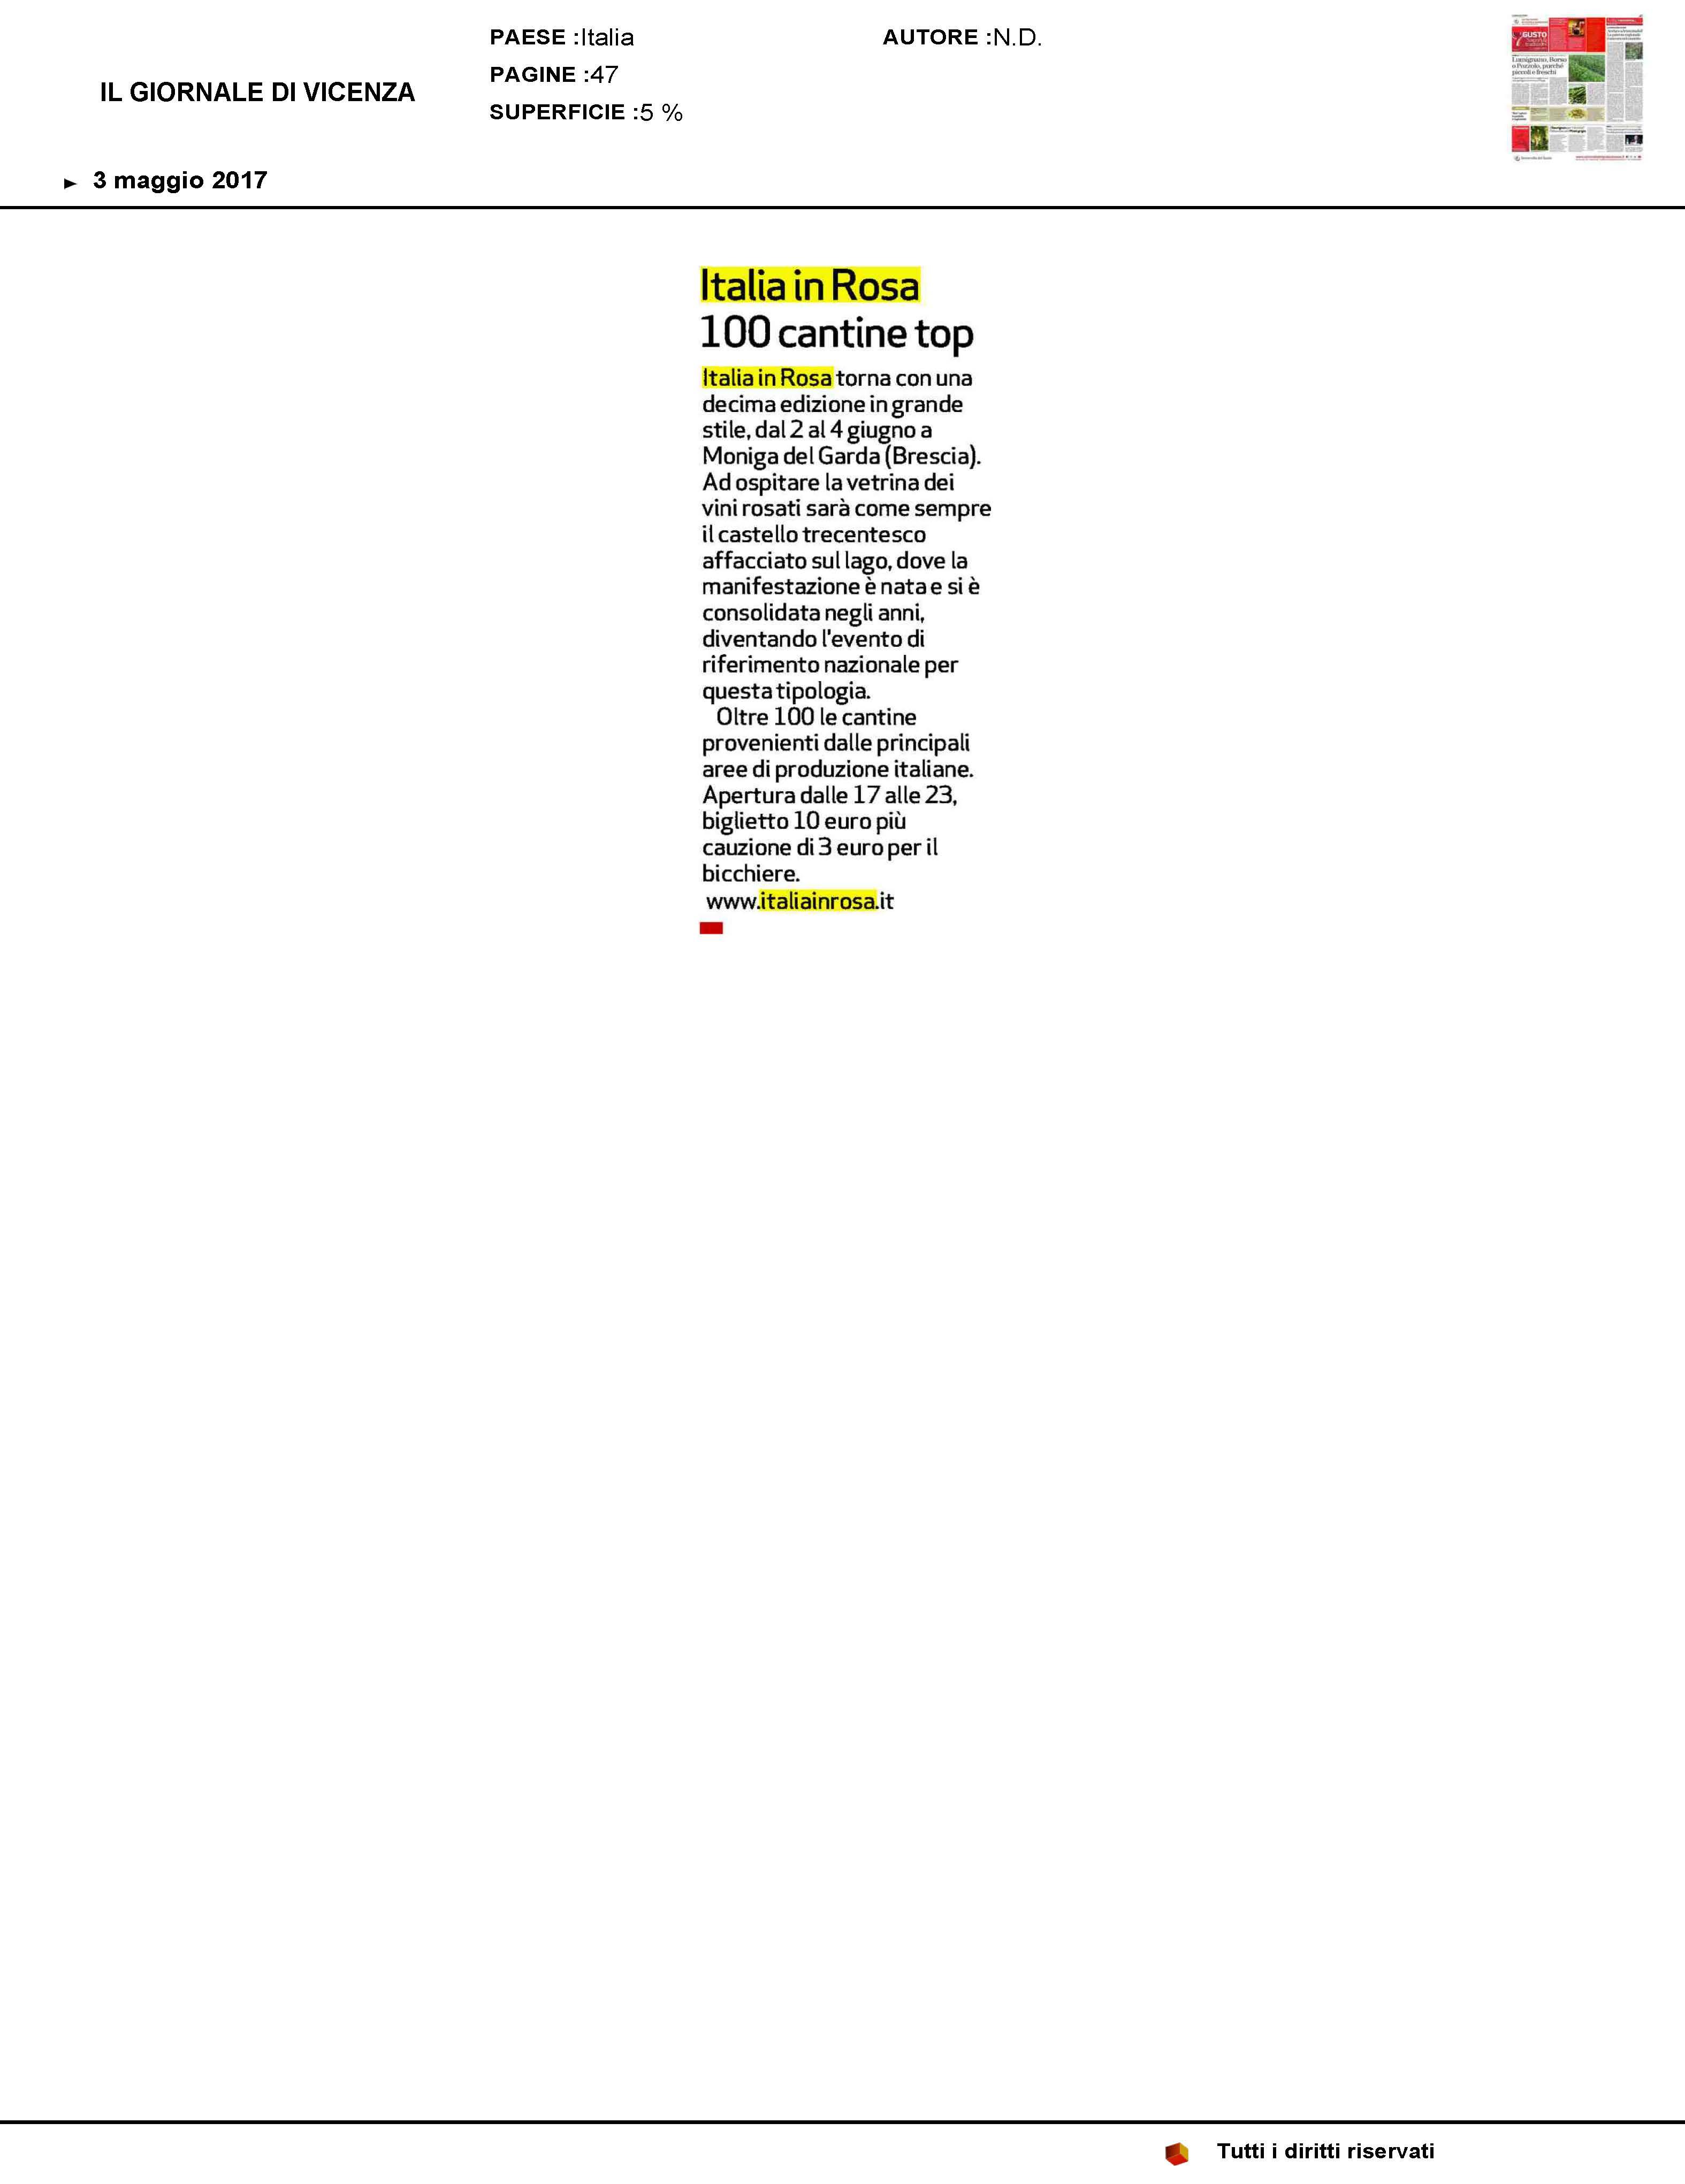 ILGIORNALEDIVICENZA_lancio 3mag17